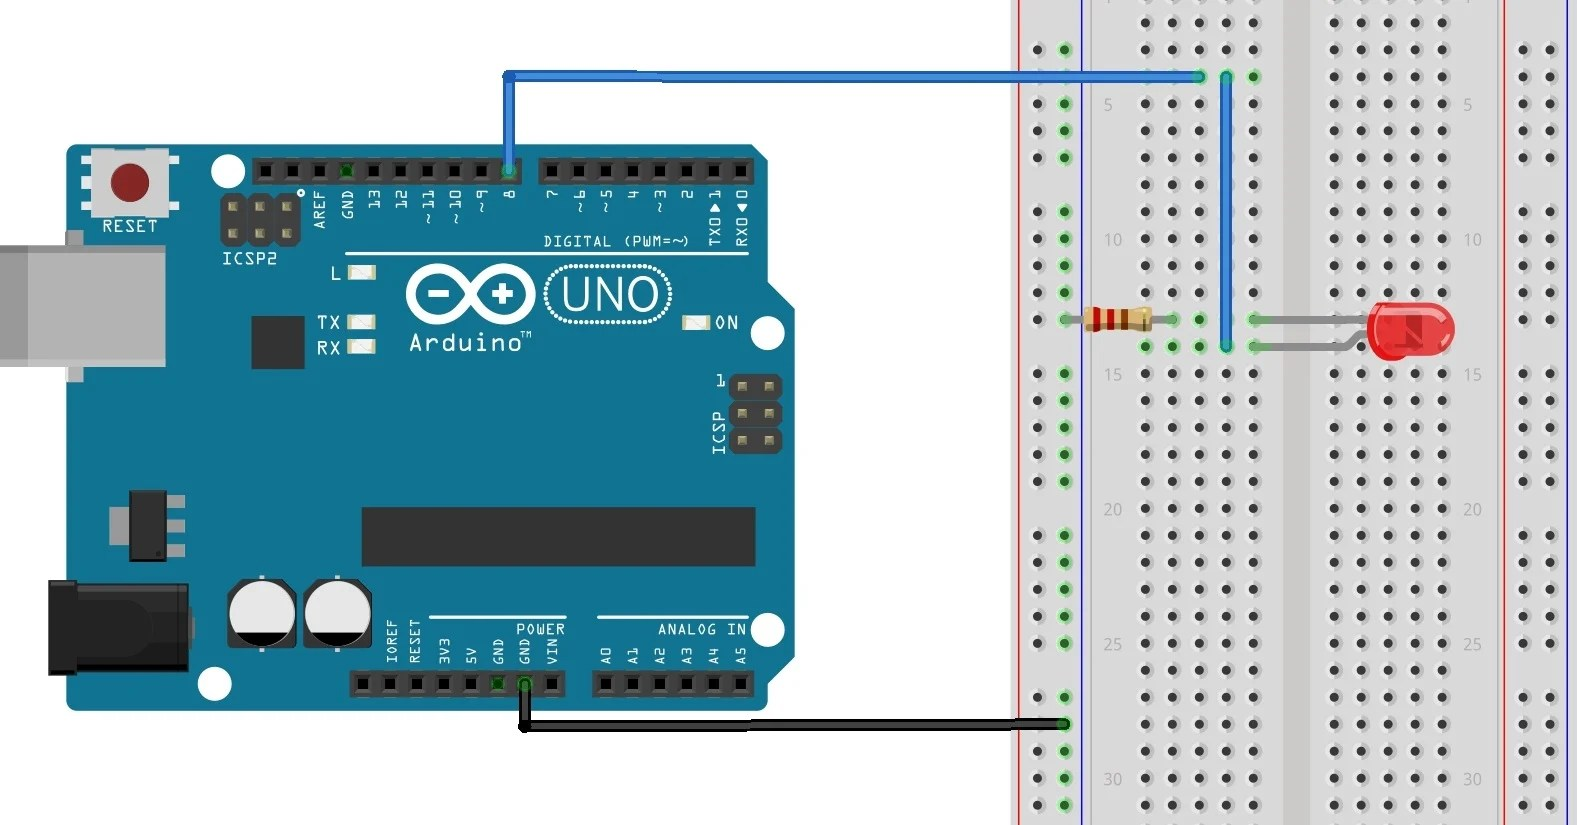 How to Use the Arduino's Digital IO